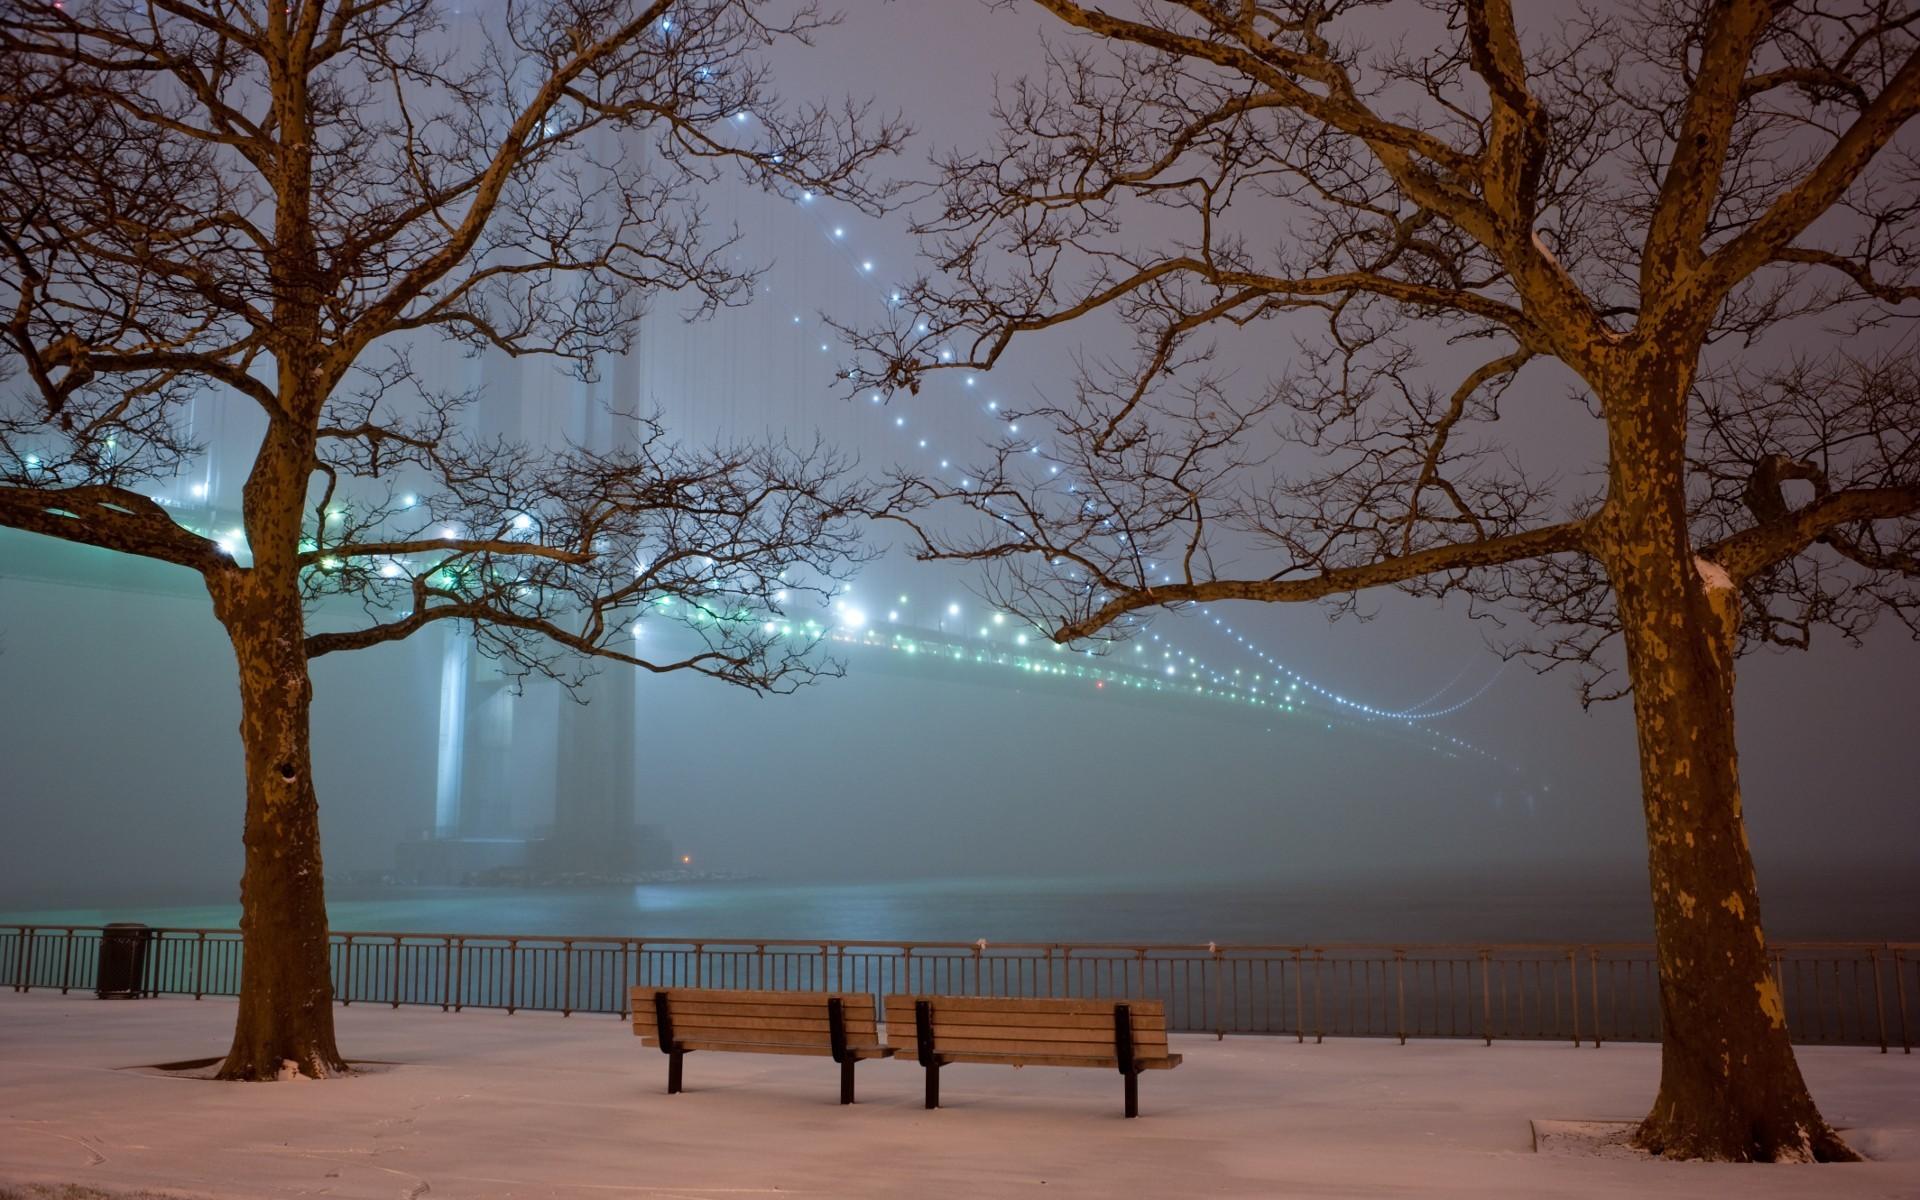 New York City Wallpaper Winter, wallpaper, New York City Wallpaper .